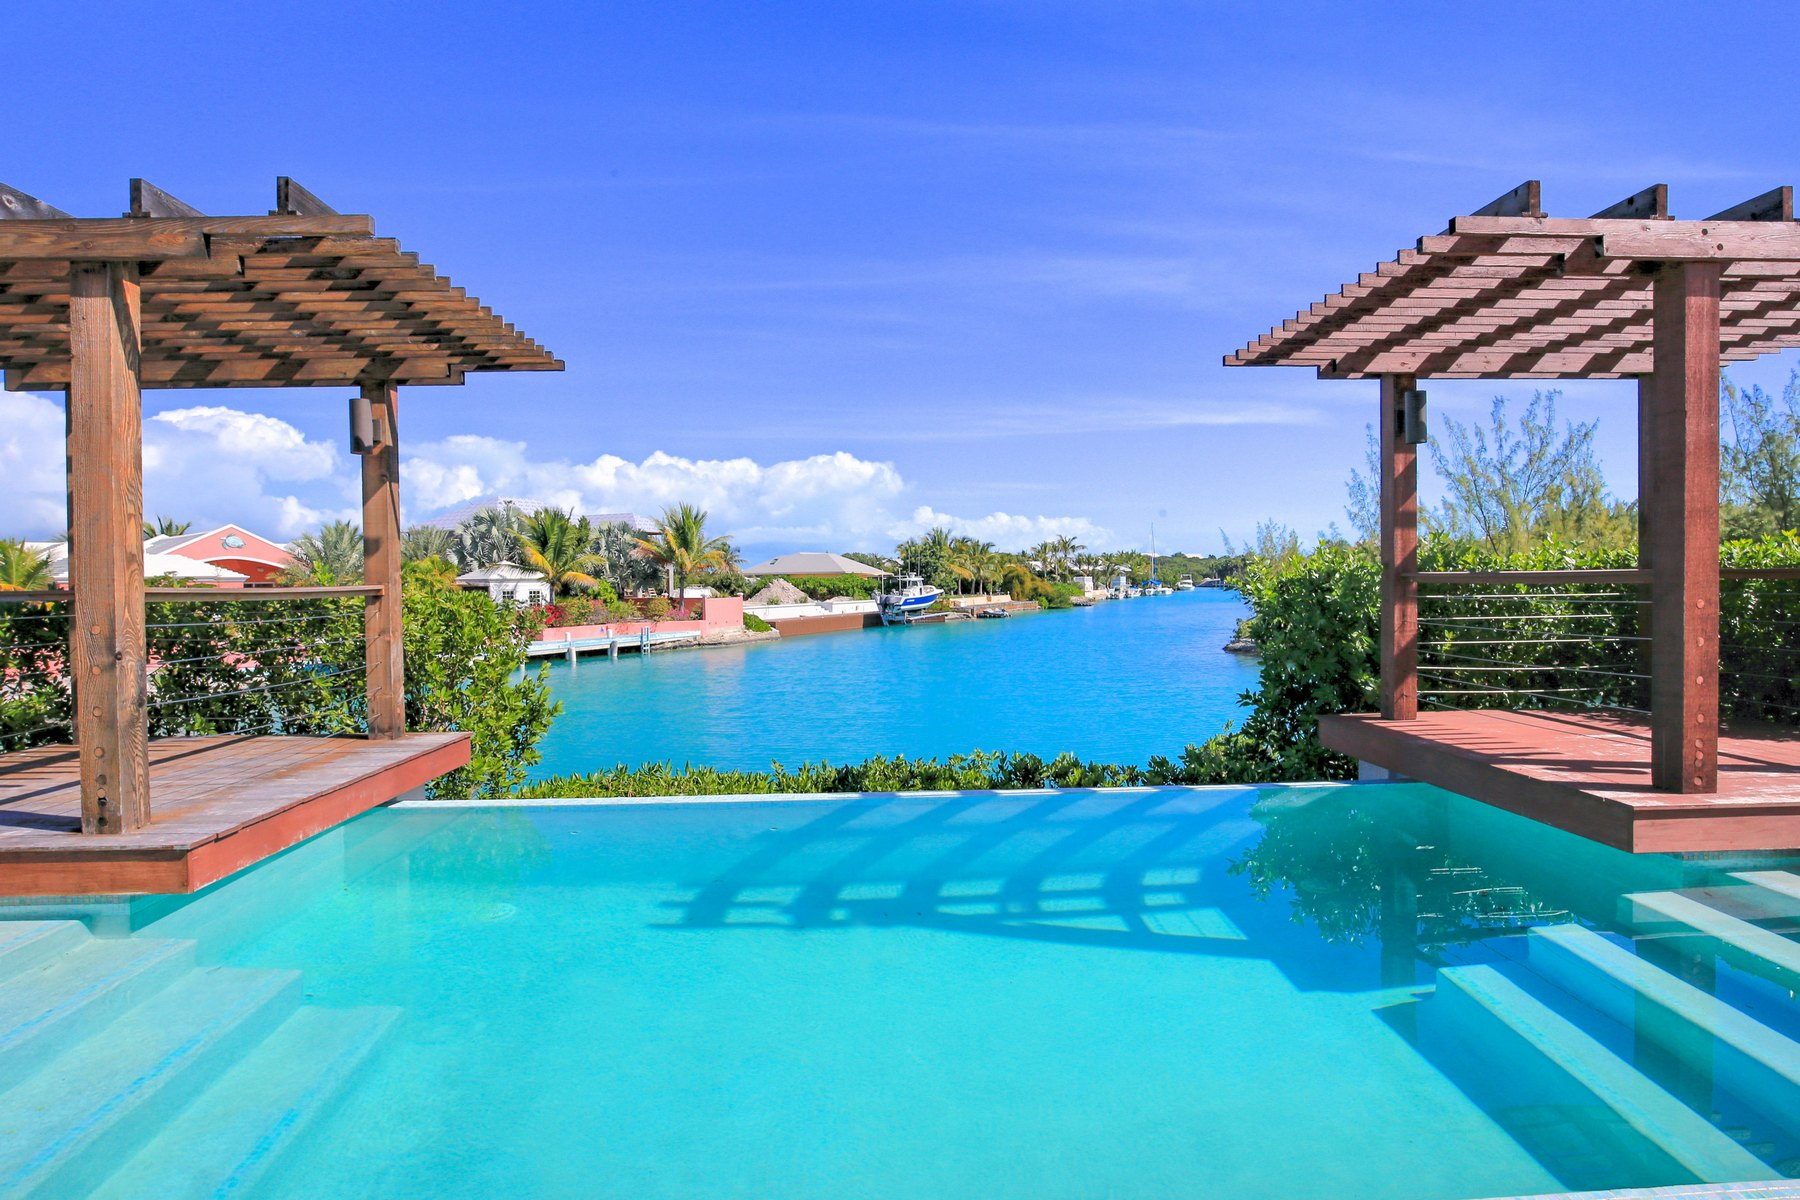 Single Family Home for Sale at Leeward Villa Leeward, Turks And Caicos Islands